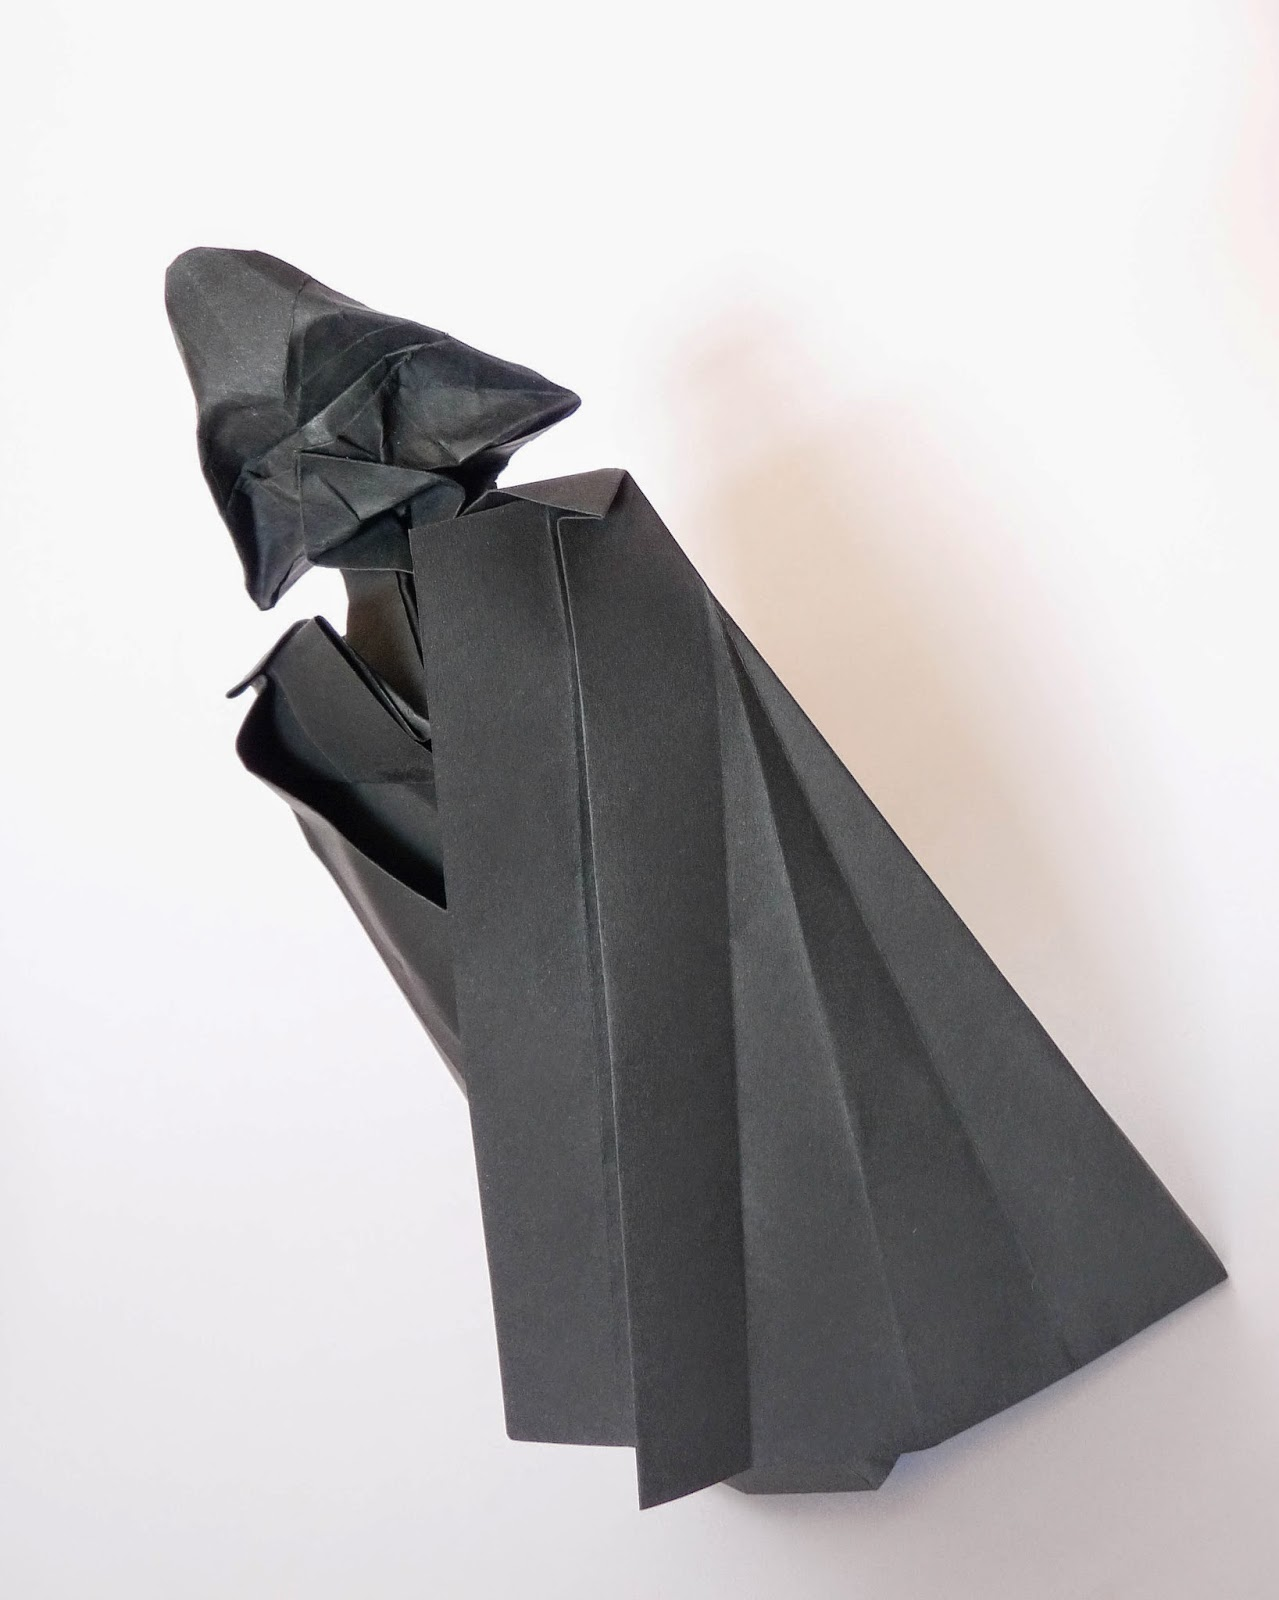 dismith origami darth vader